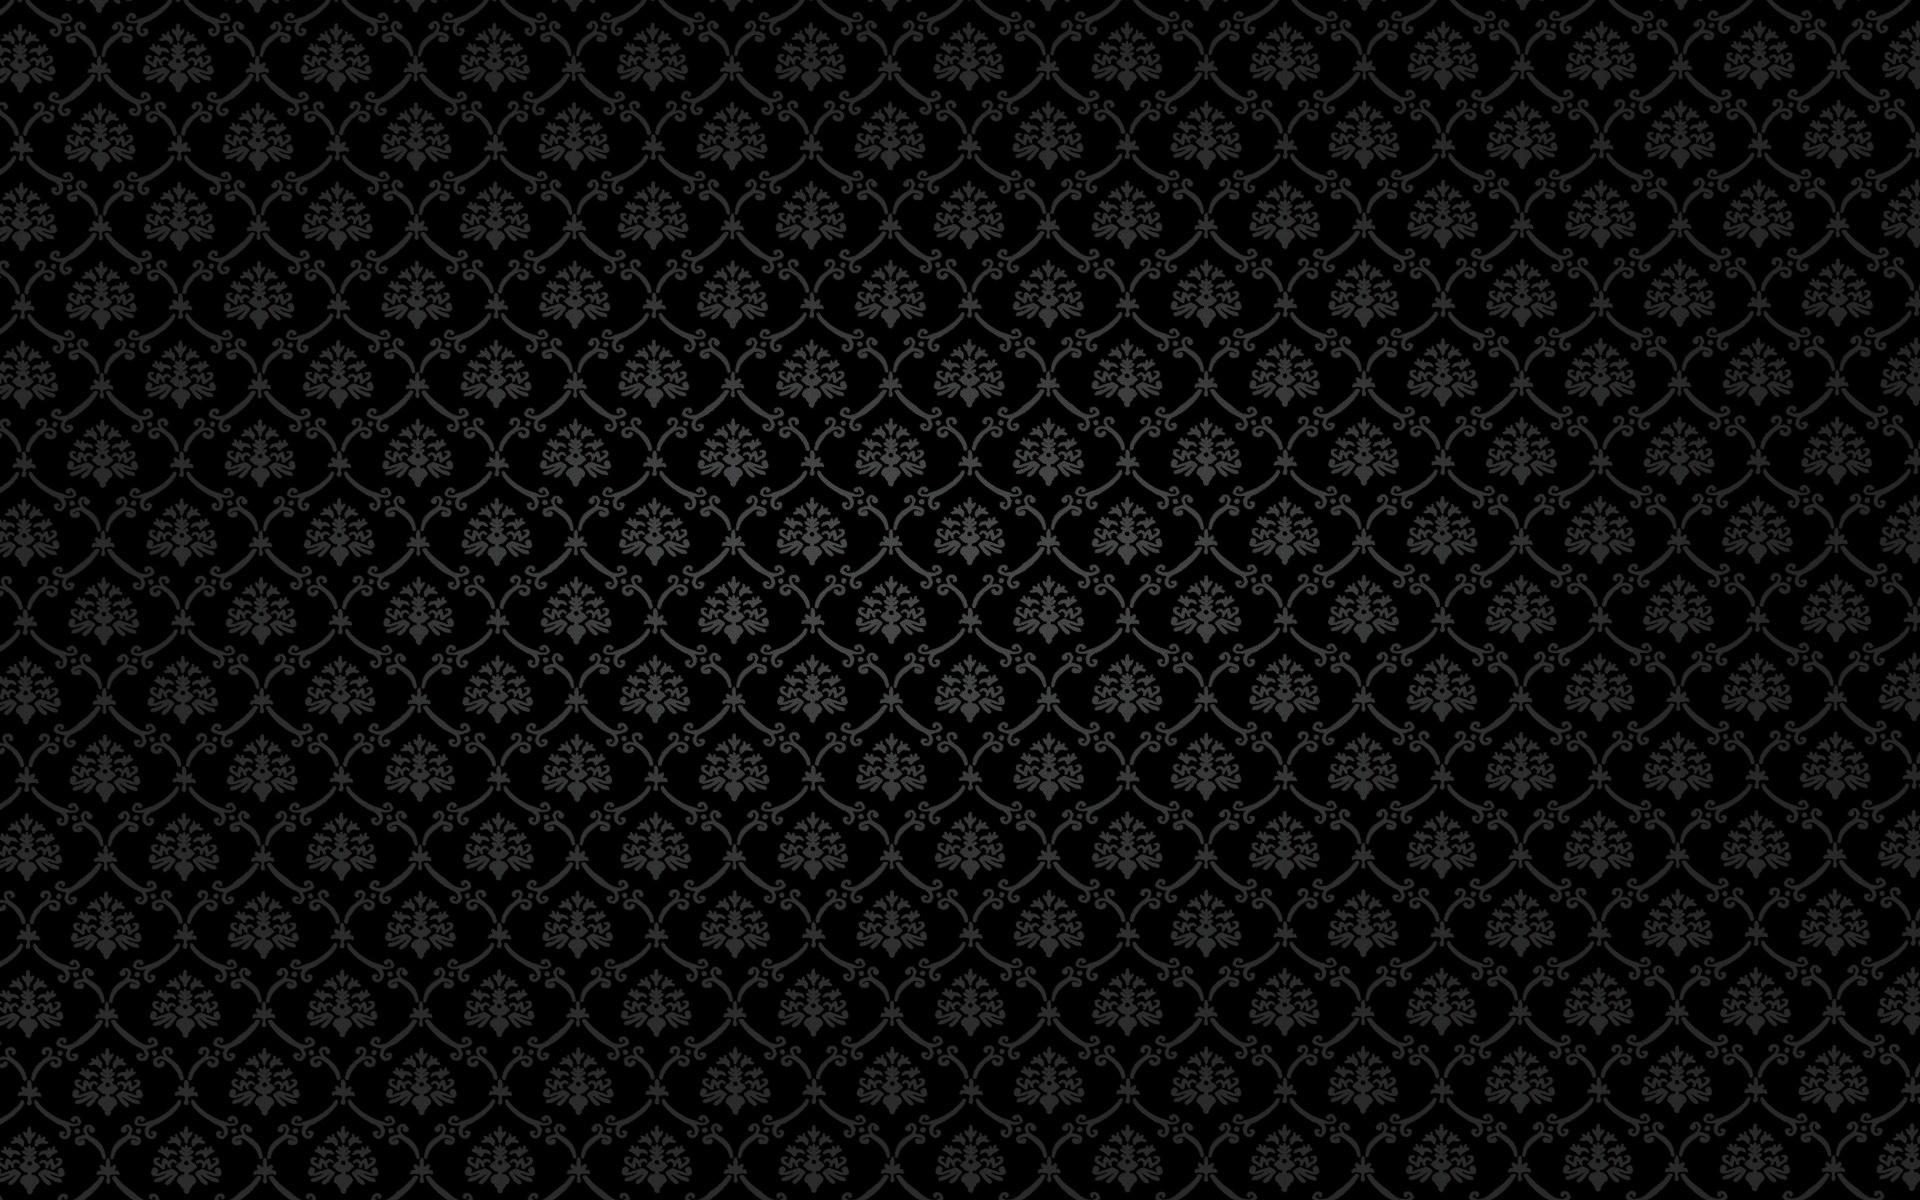 HD Wallpaper Computer Wallpapers Desktop Backgrounds 1920x1200 ID 1920x1200